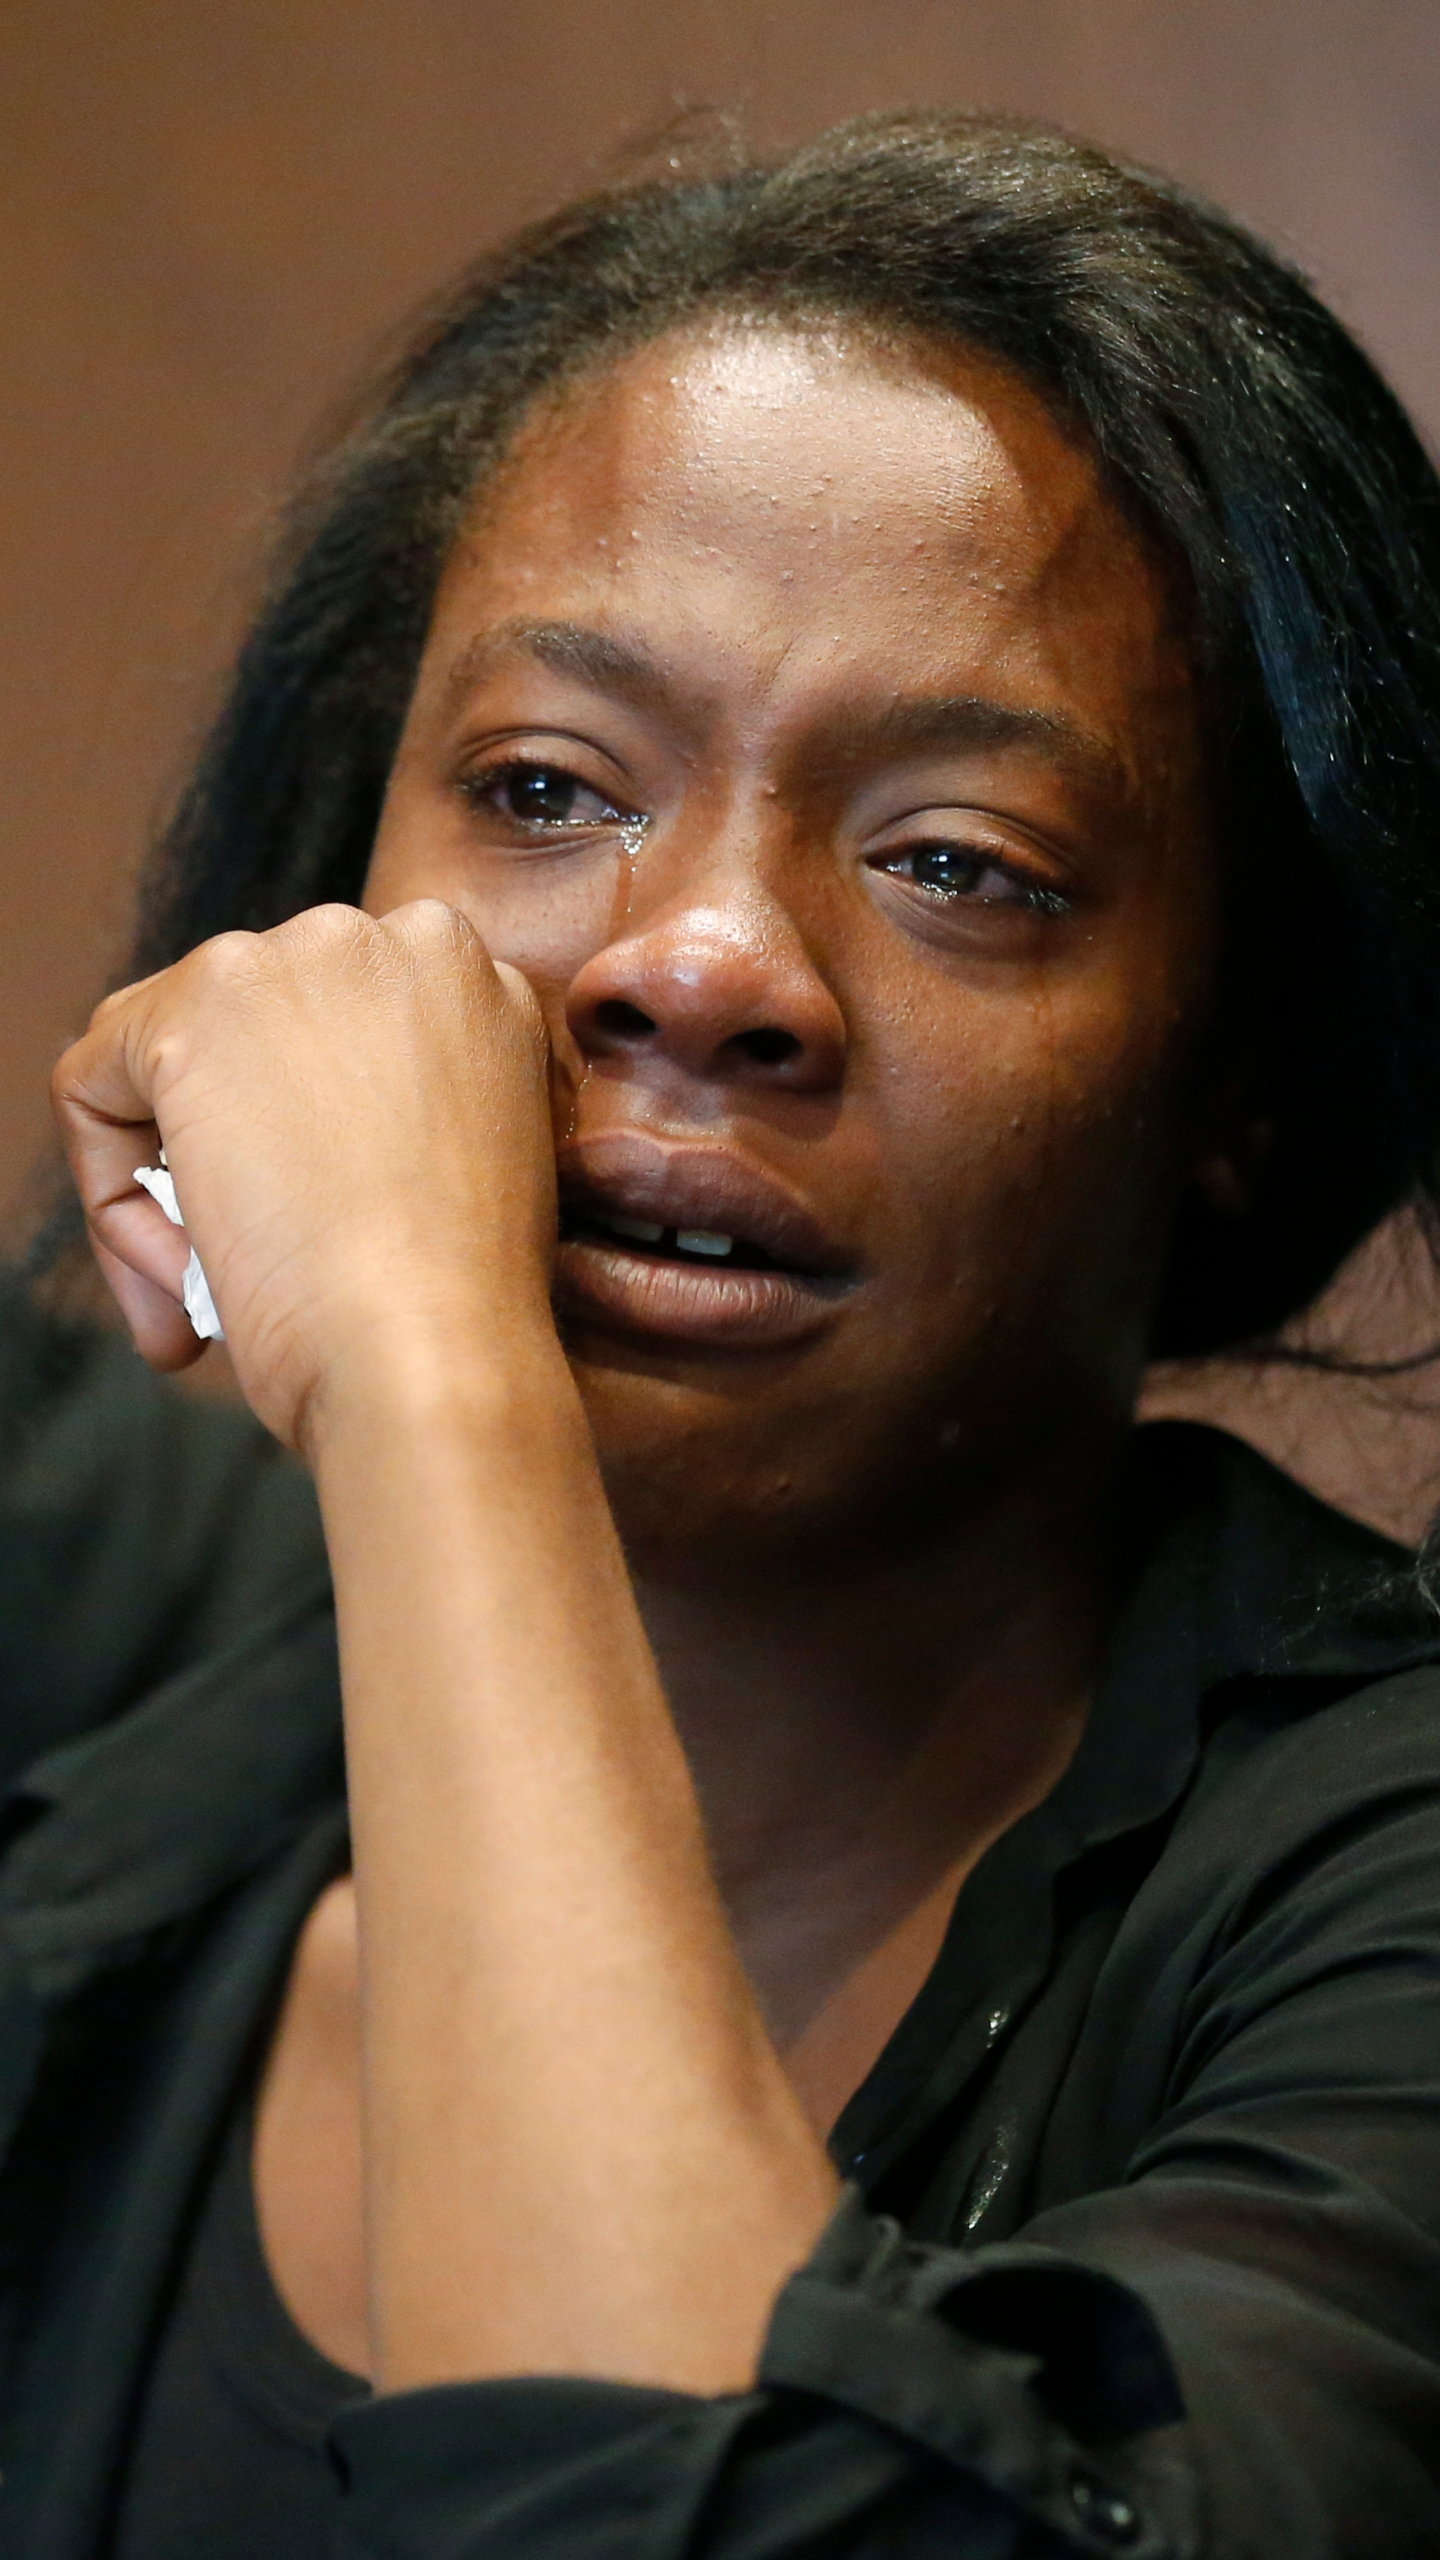 Olivia Hill wipes away tears as she speaks